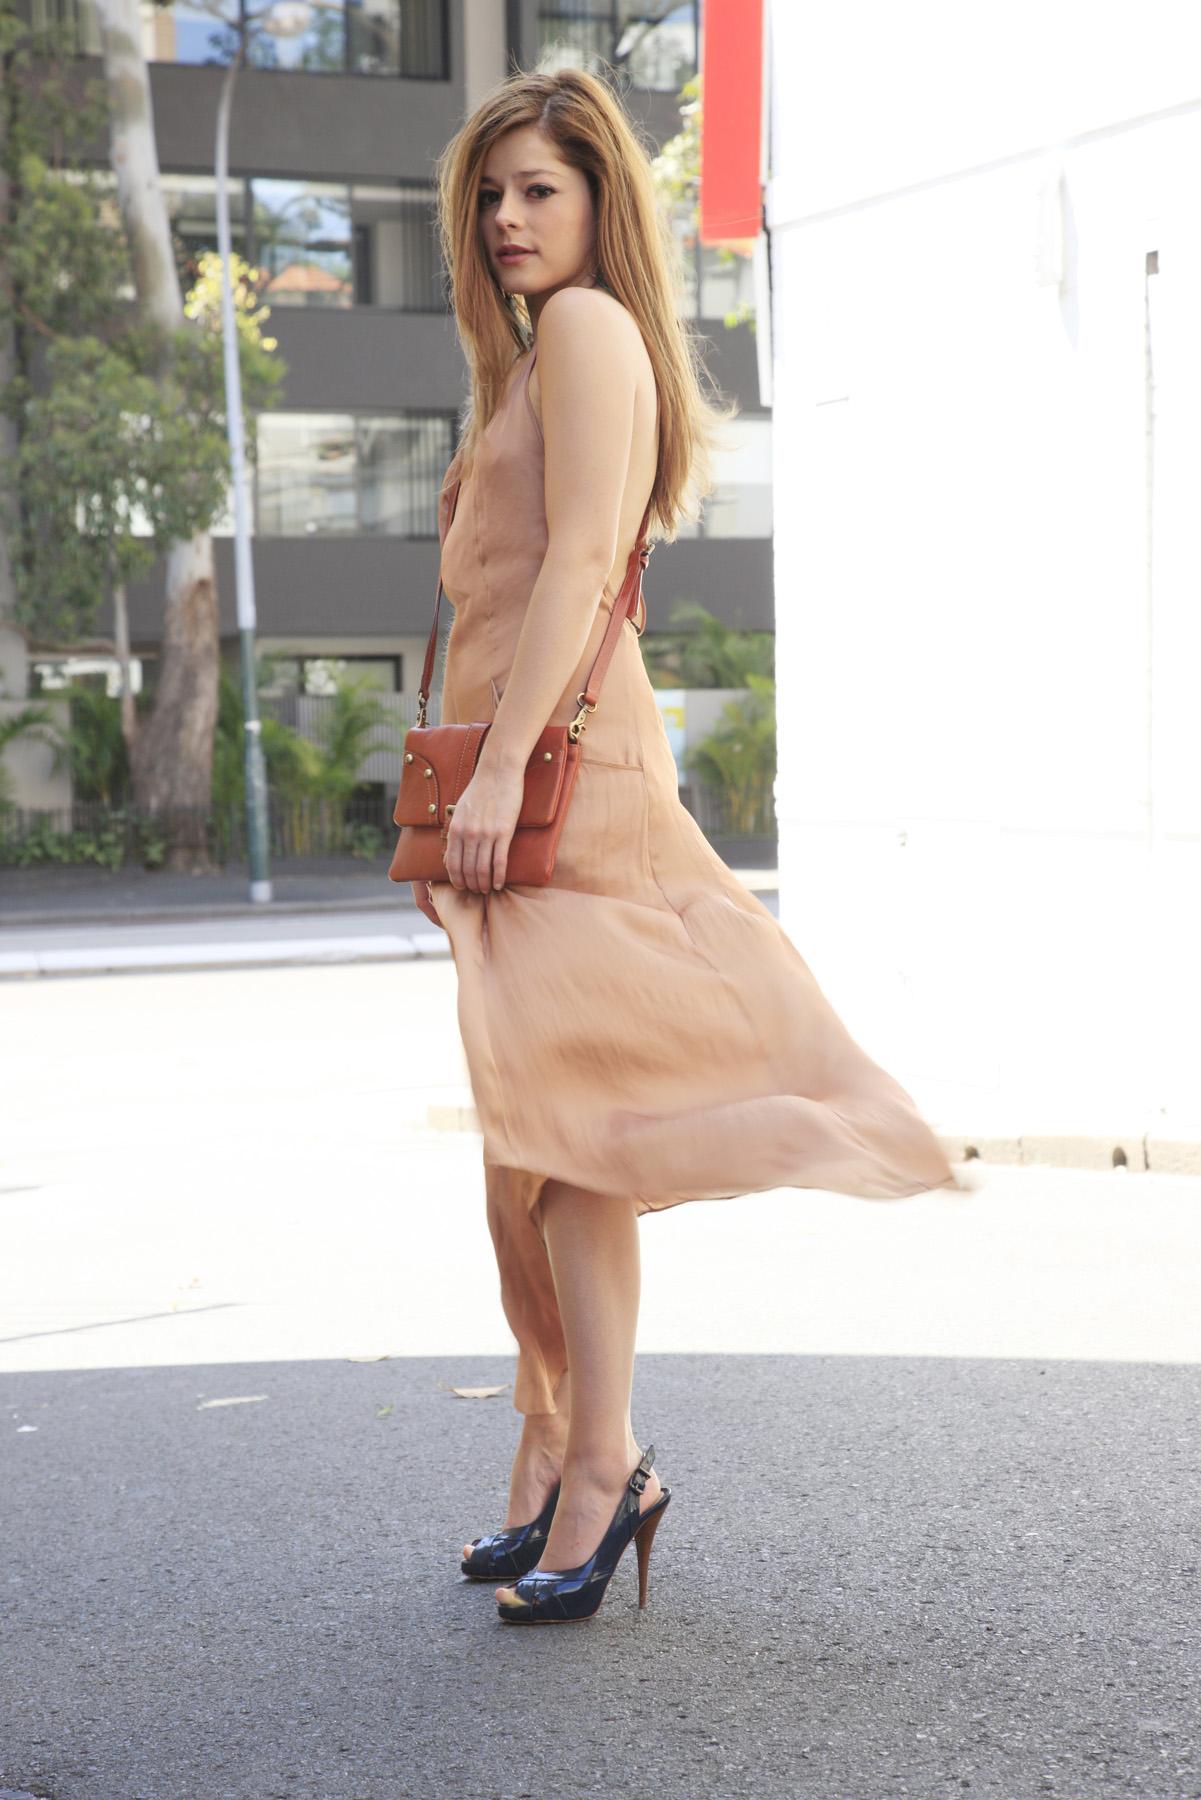 Dress:  ZARA    Earrings:   BLEAK Designs   Shoes:  Fendi   Bag:  Mulberry